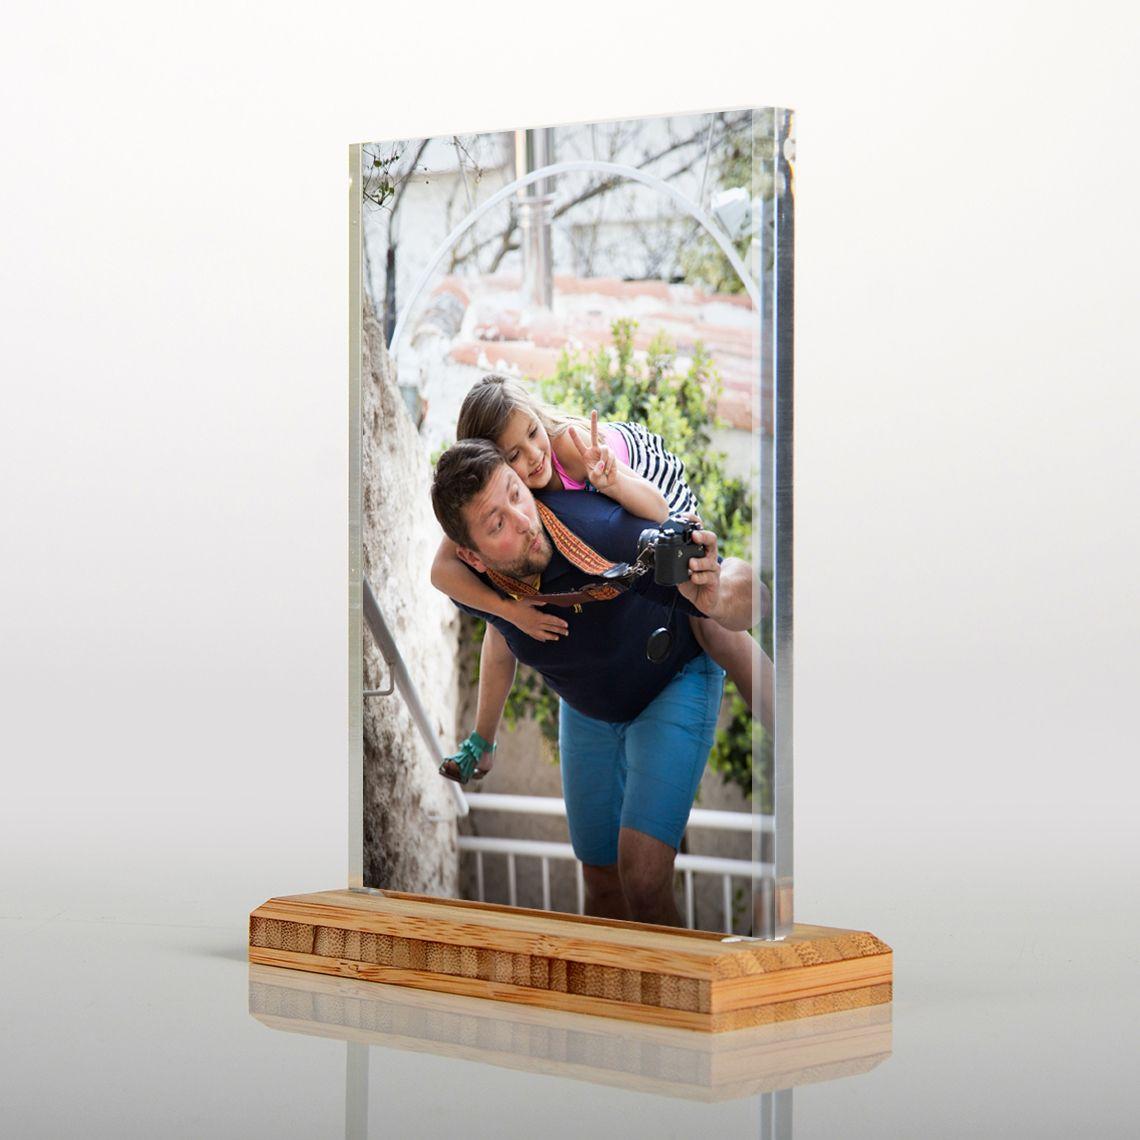 Acrylic Photo Frame With Wooden Base Porta Foto Fotos Ambientacao